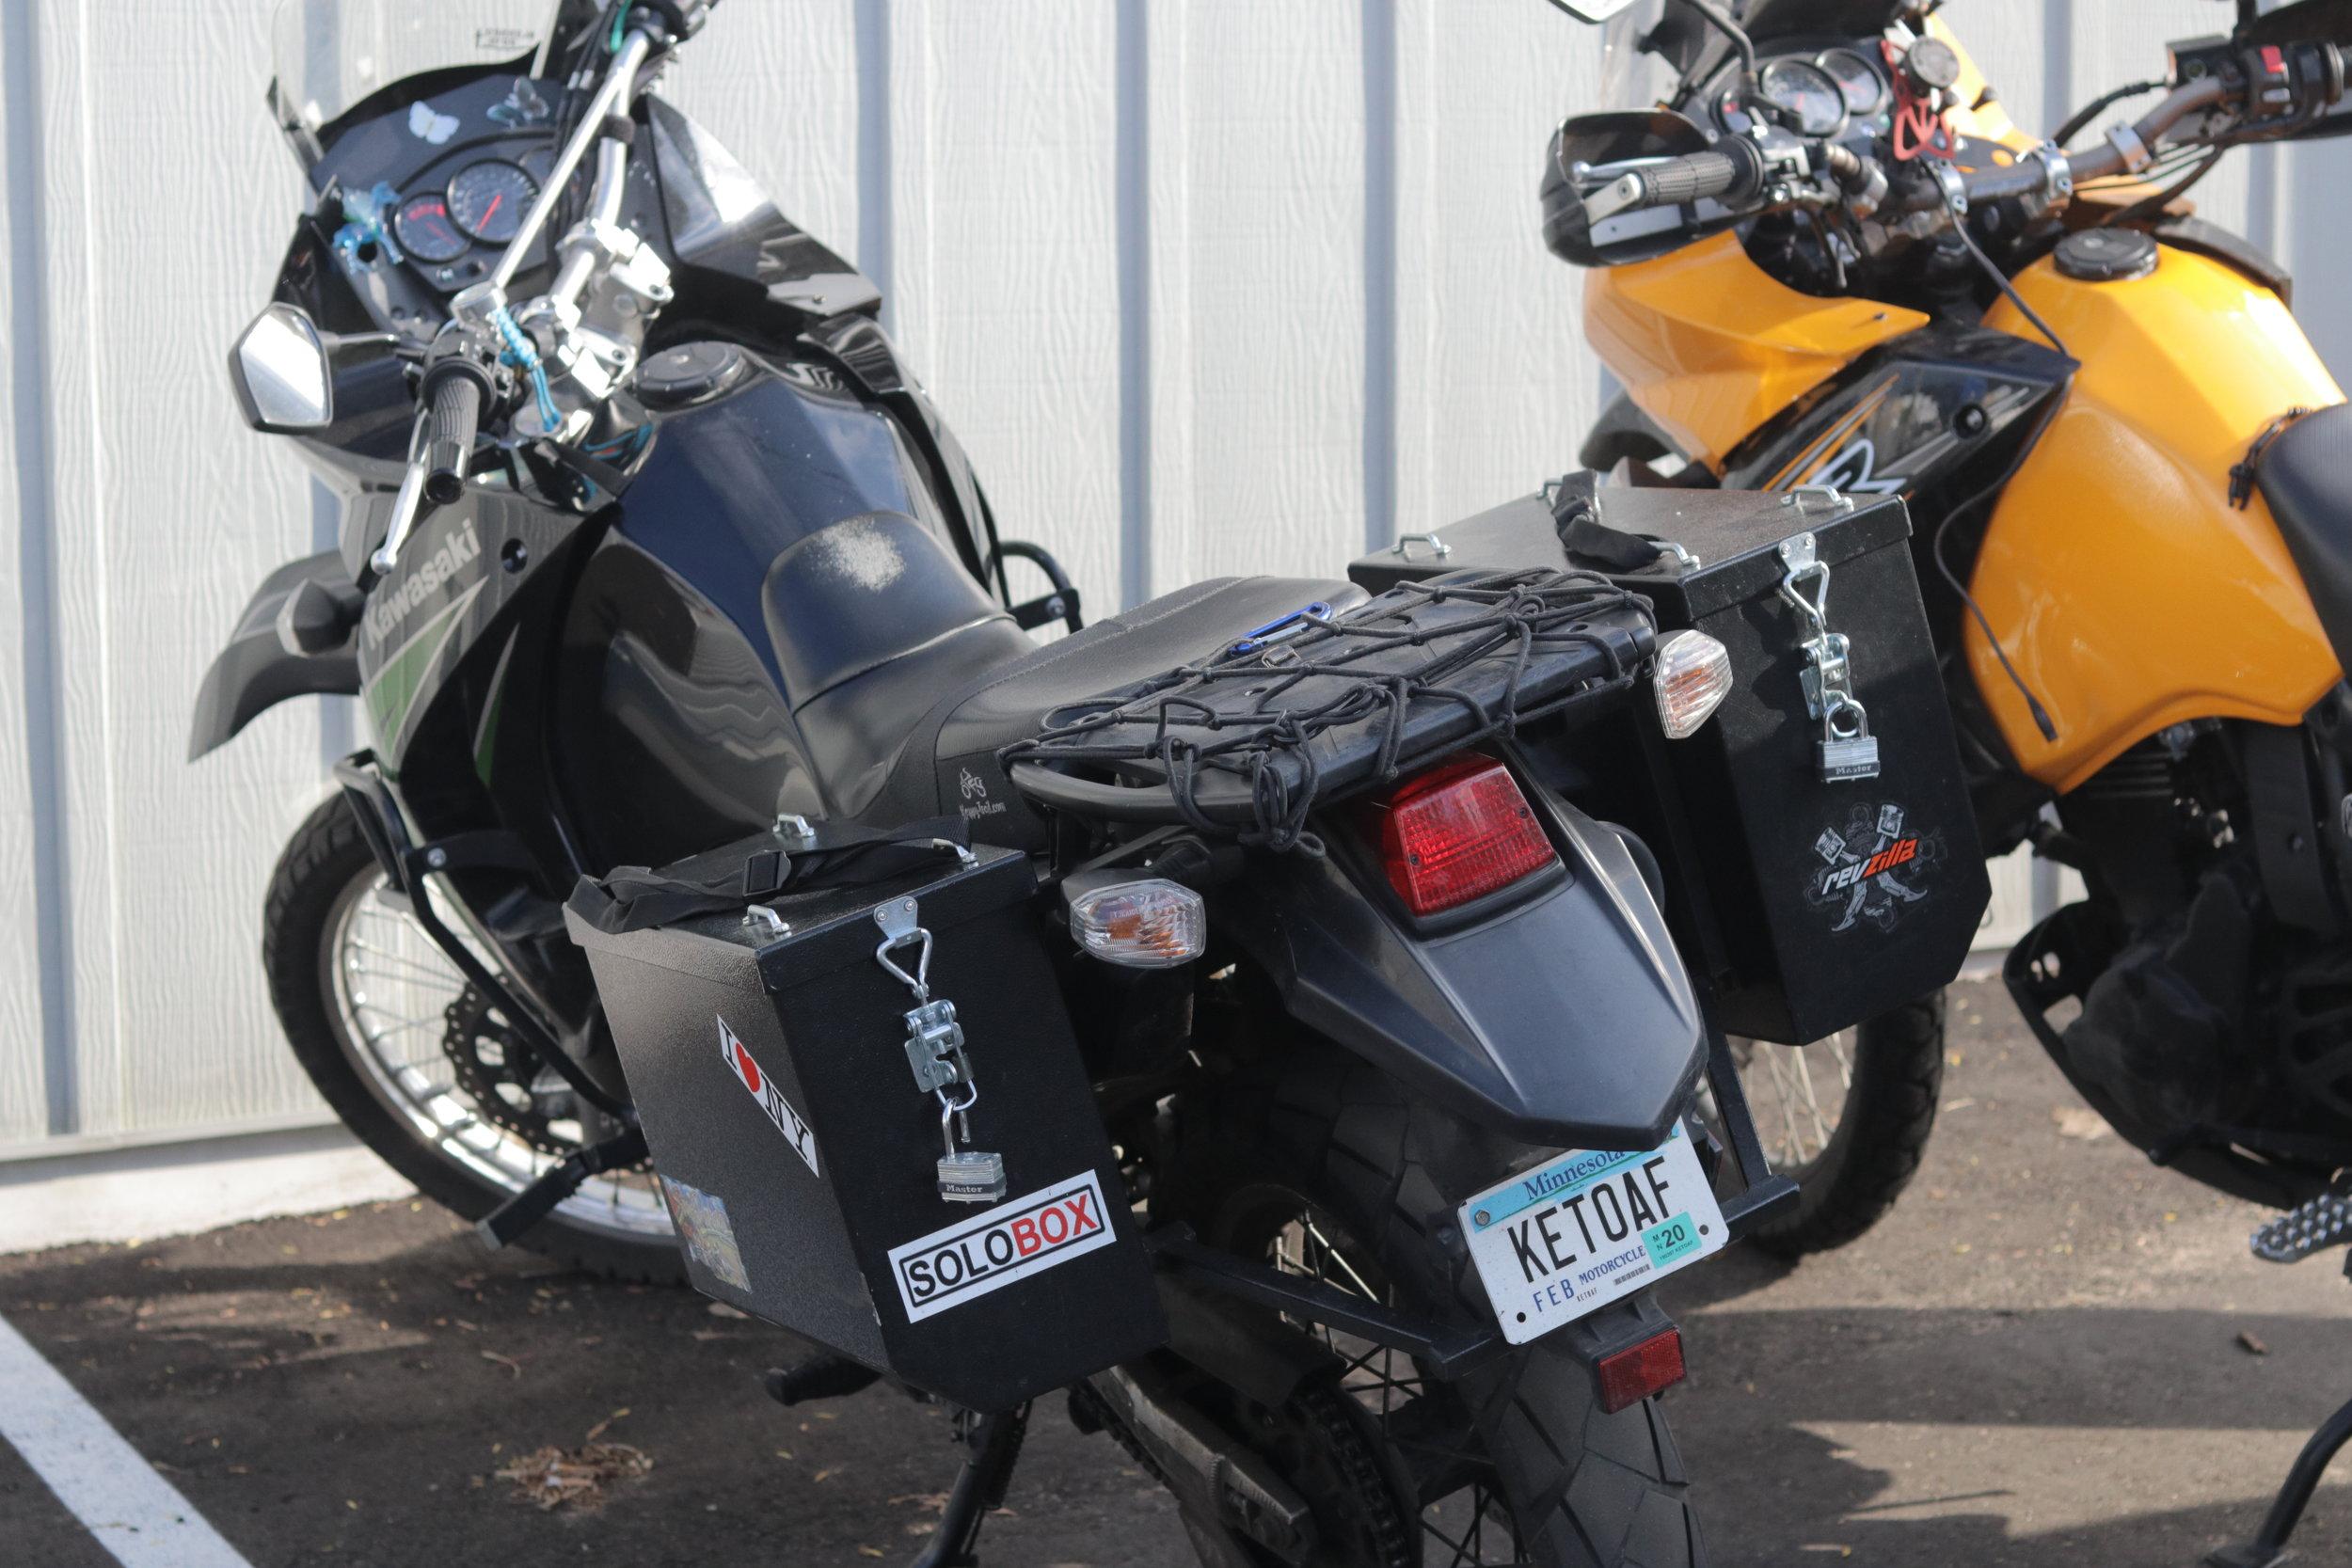 Brenda Zorn's Motorcycle